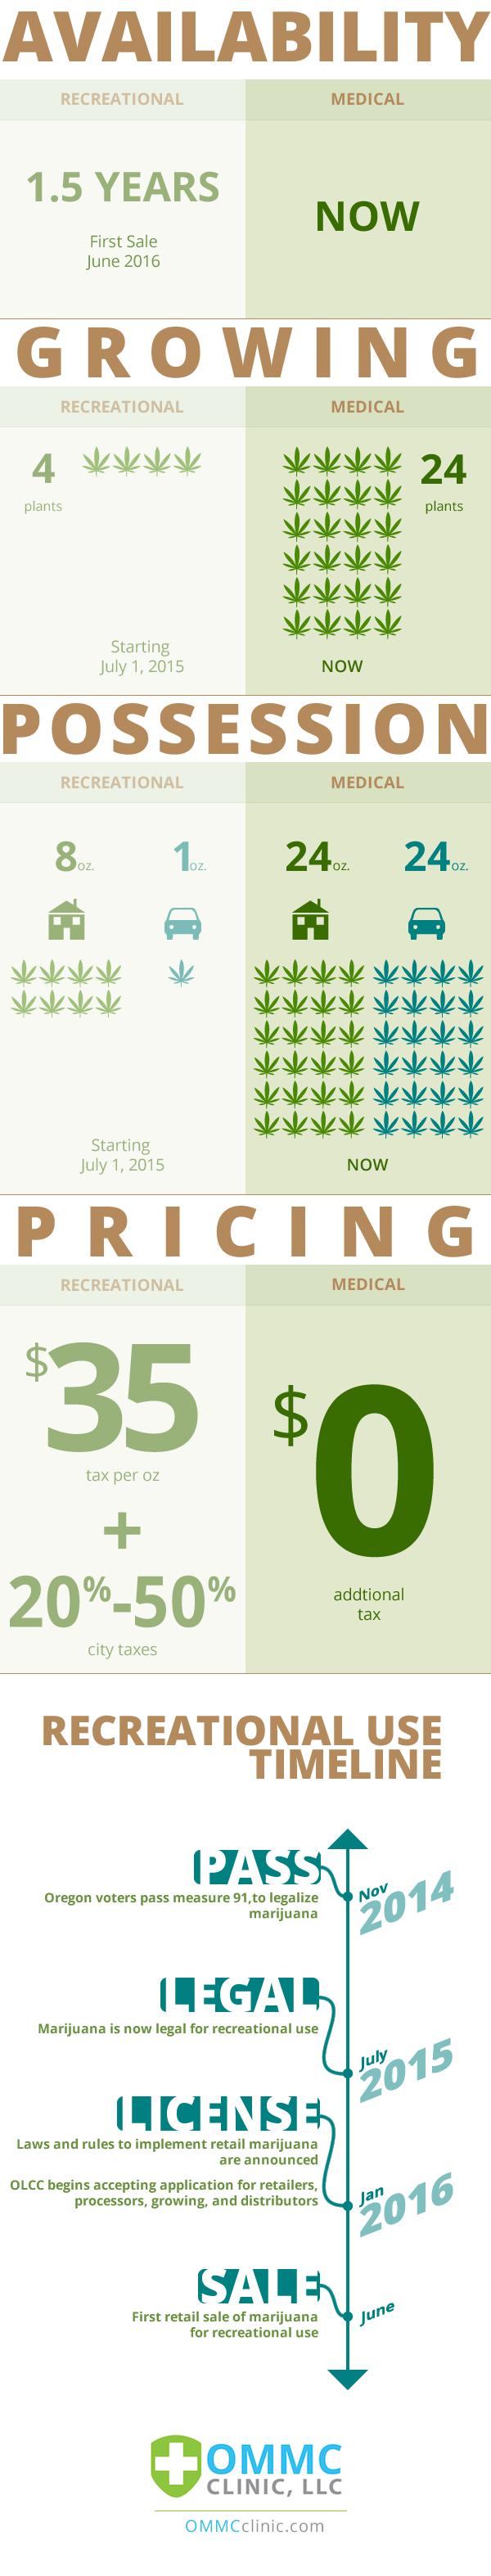 GreenWay-Oregon-Medical-Marijuana-Vs-Recreational-Marijuana-Info-Graphic